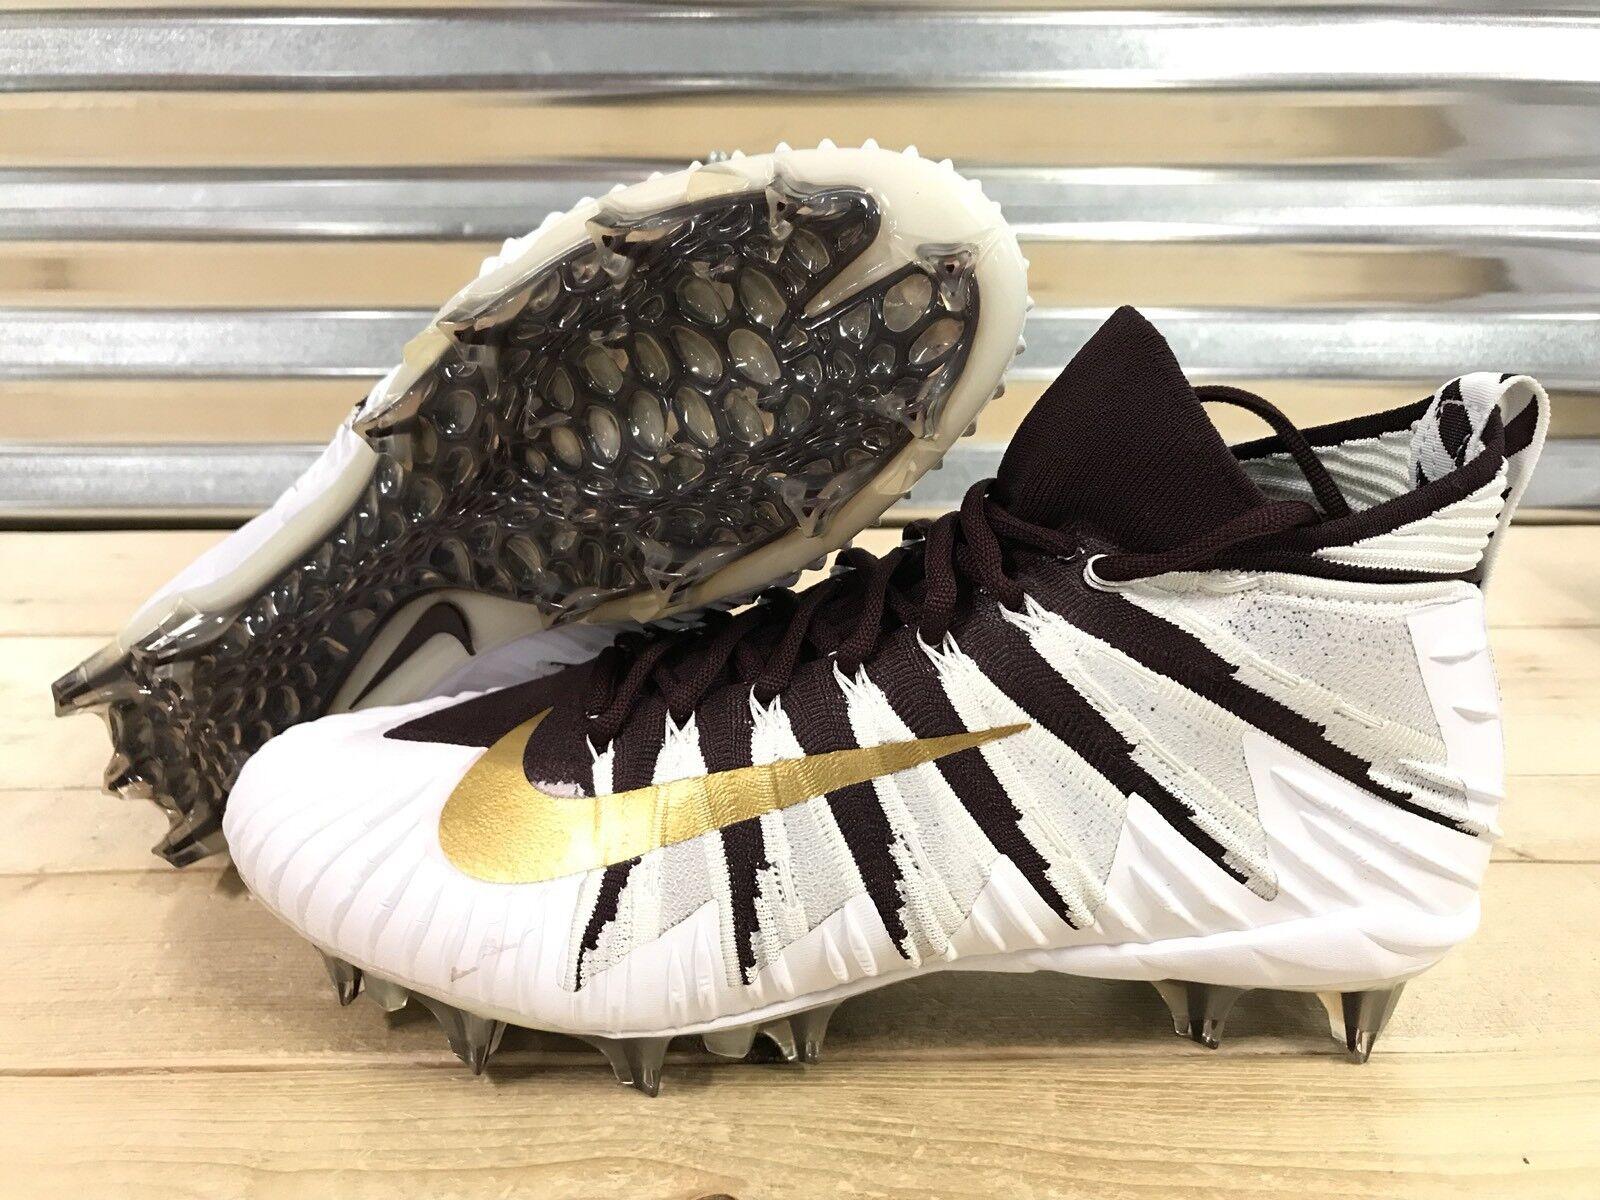 Nike Alpha Menace Elite Football Cleats Maroon Metallic Gold SZ ( 877141-671 )